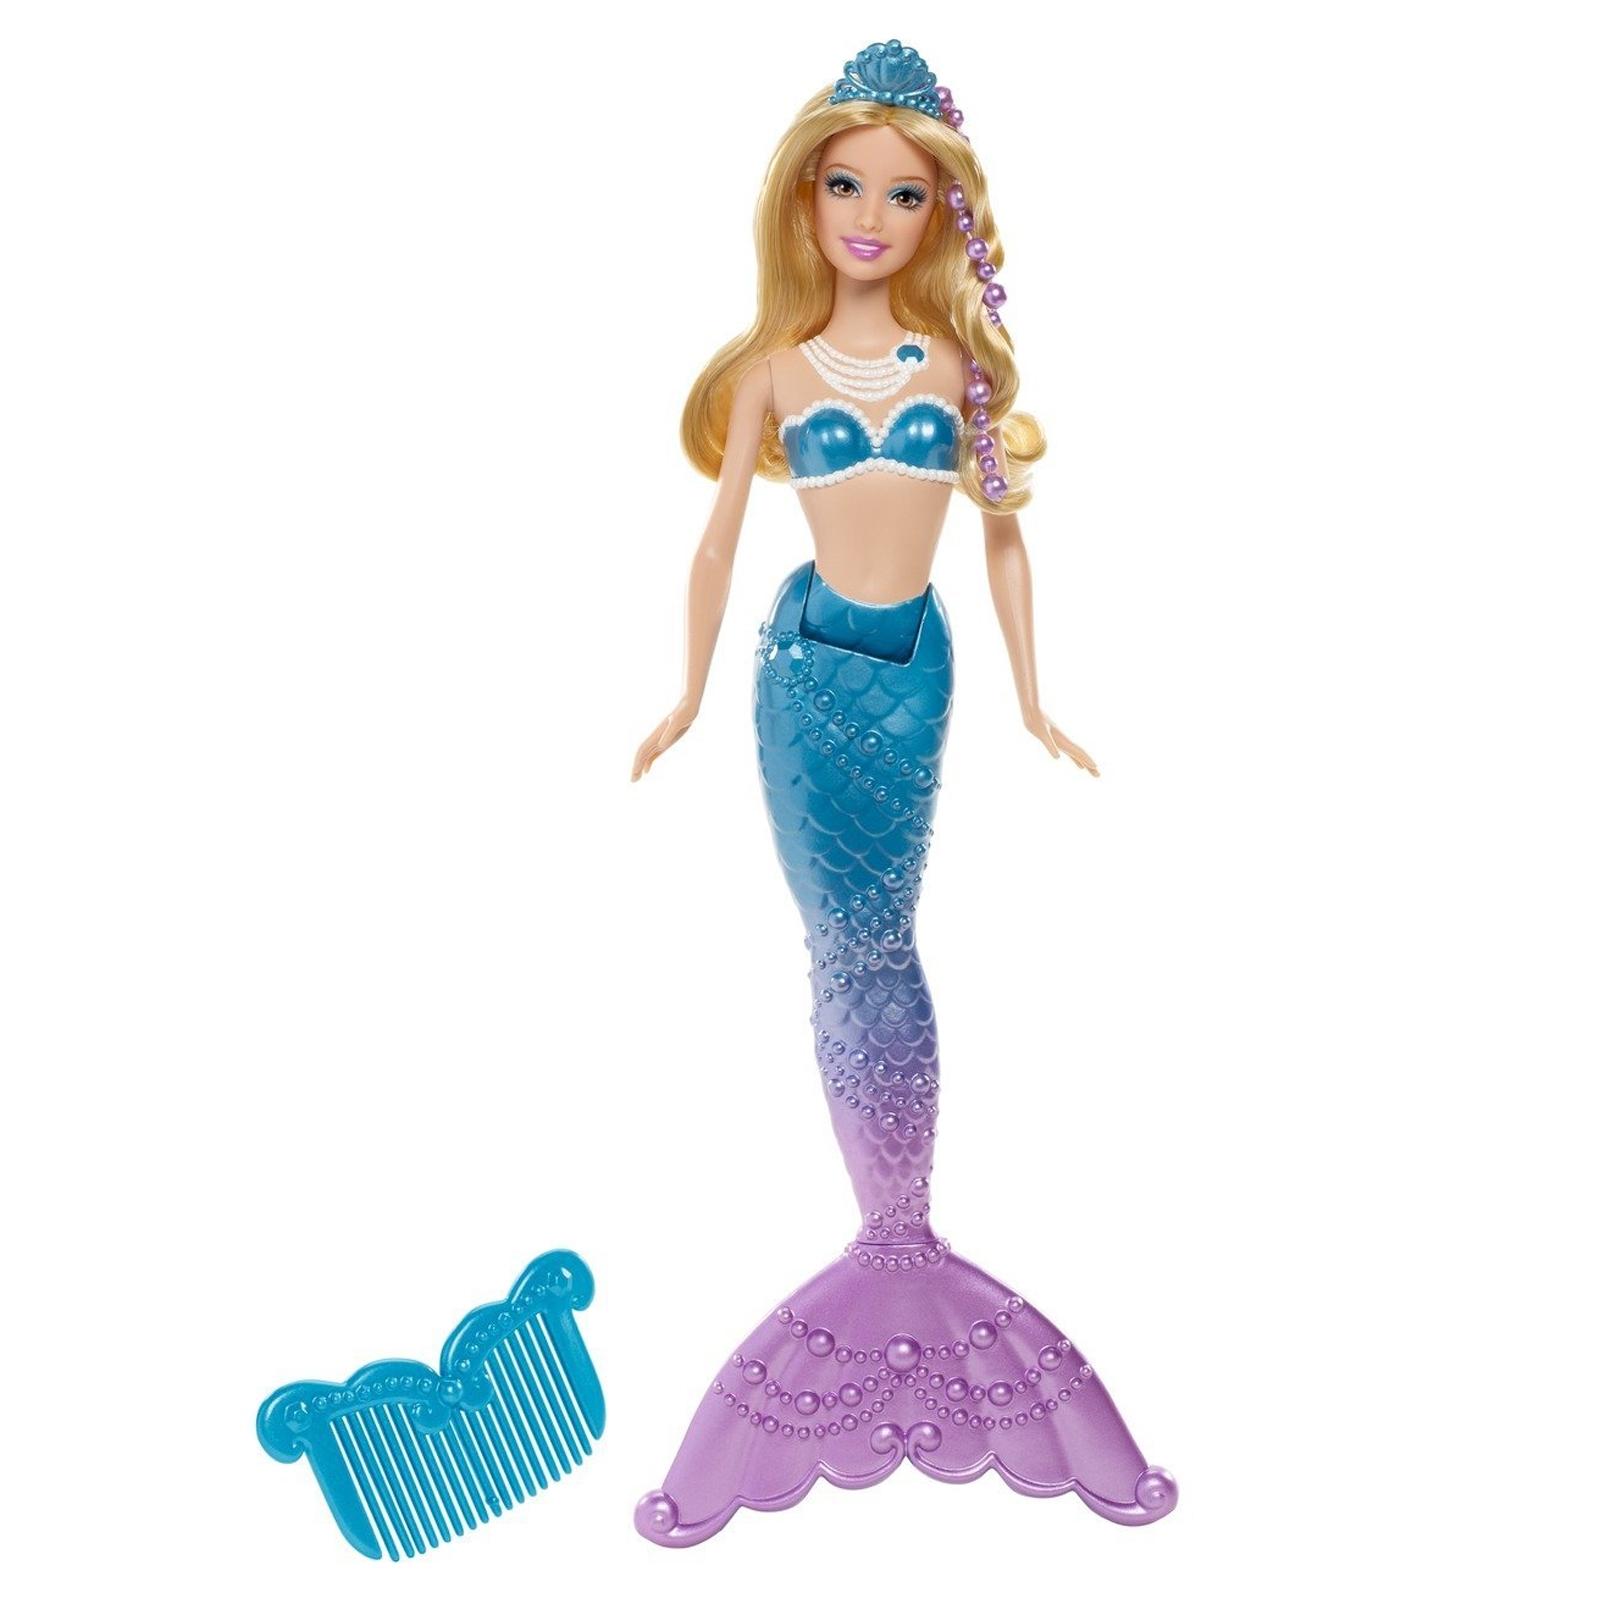 Mattel Barbie Princess Doll -Blue